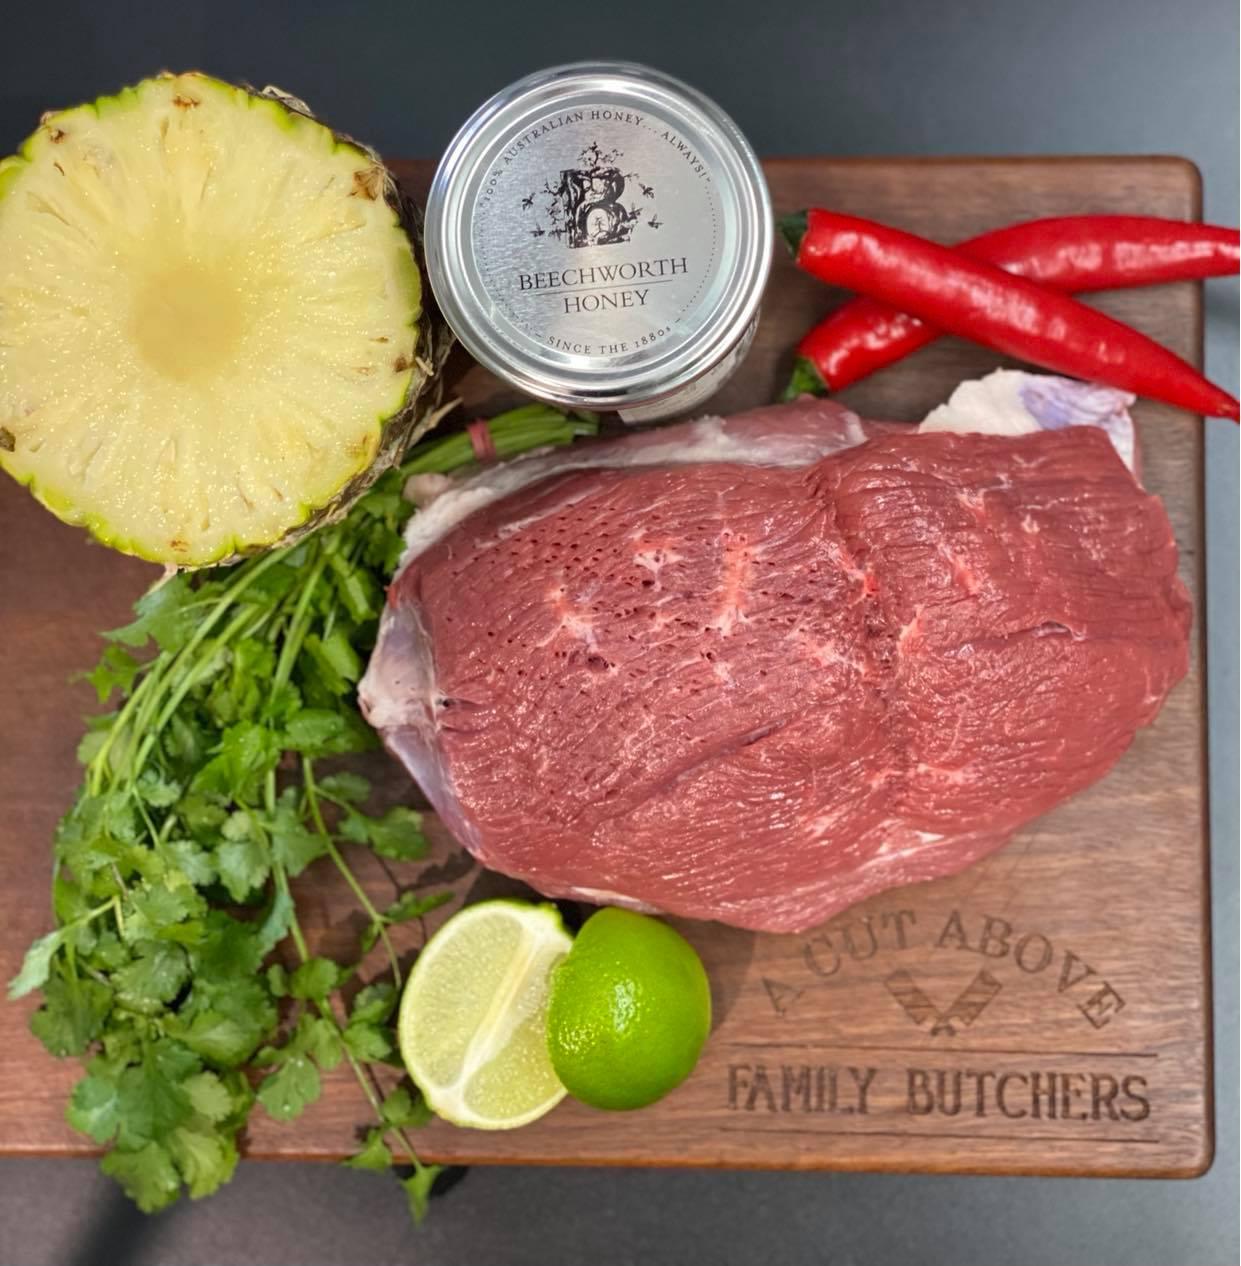 honey pineapple and chilli lamb leg recipe from Australian lamb